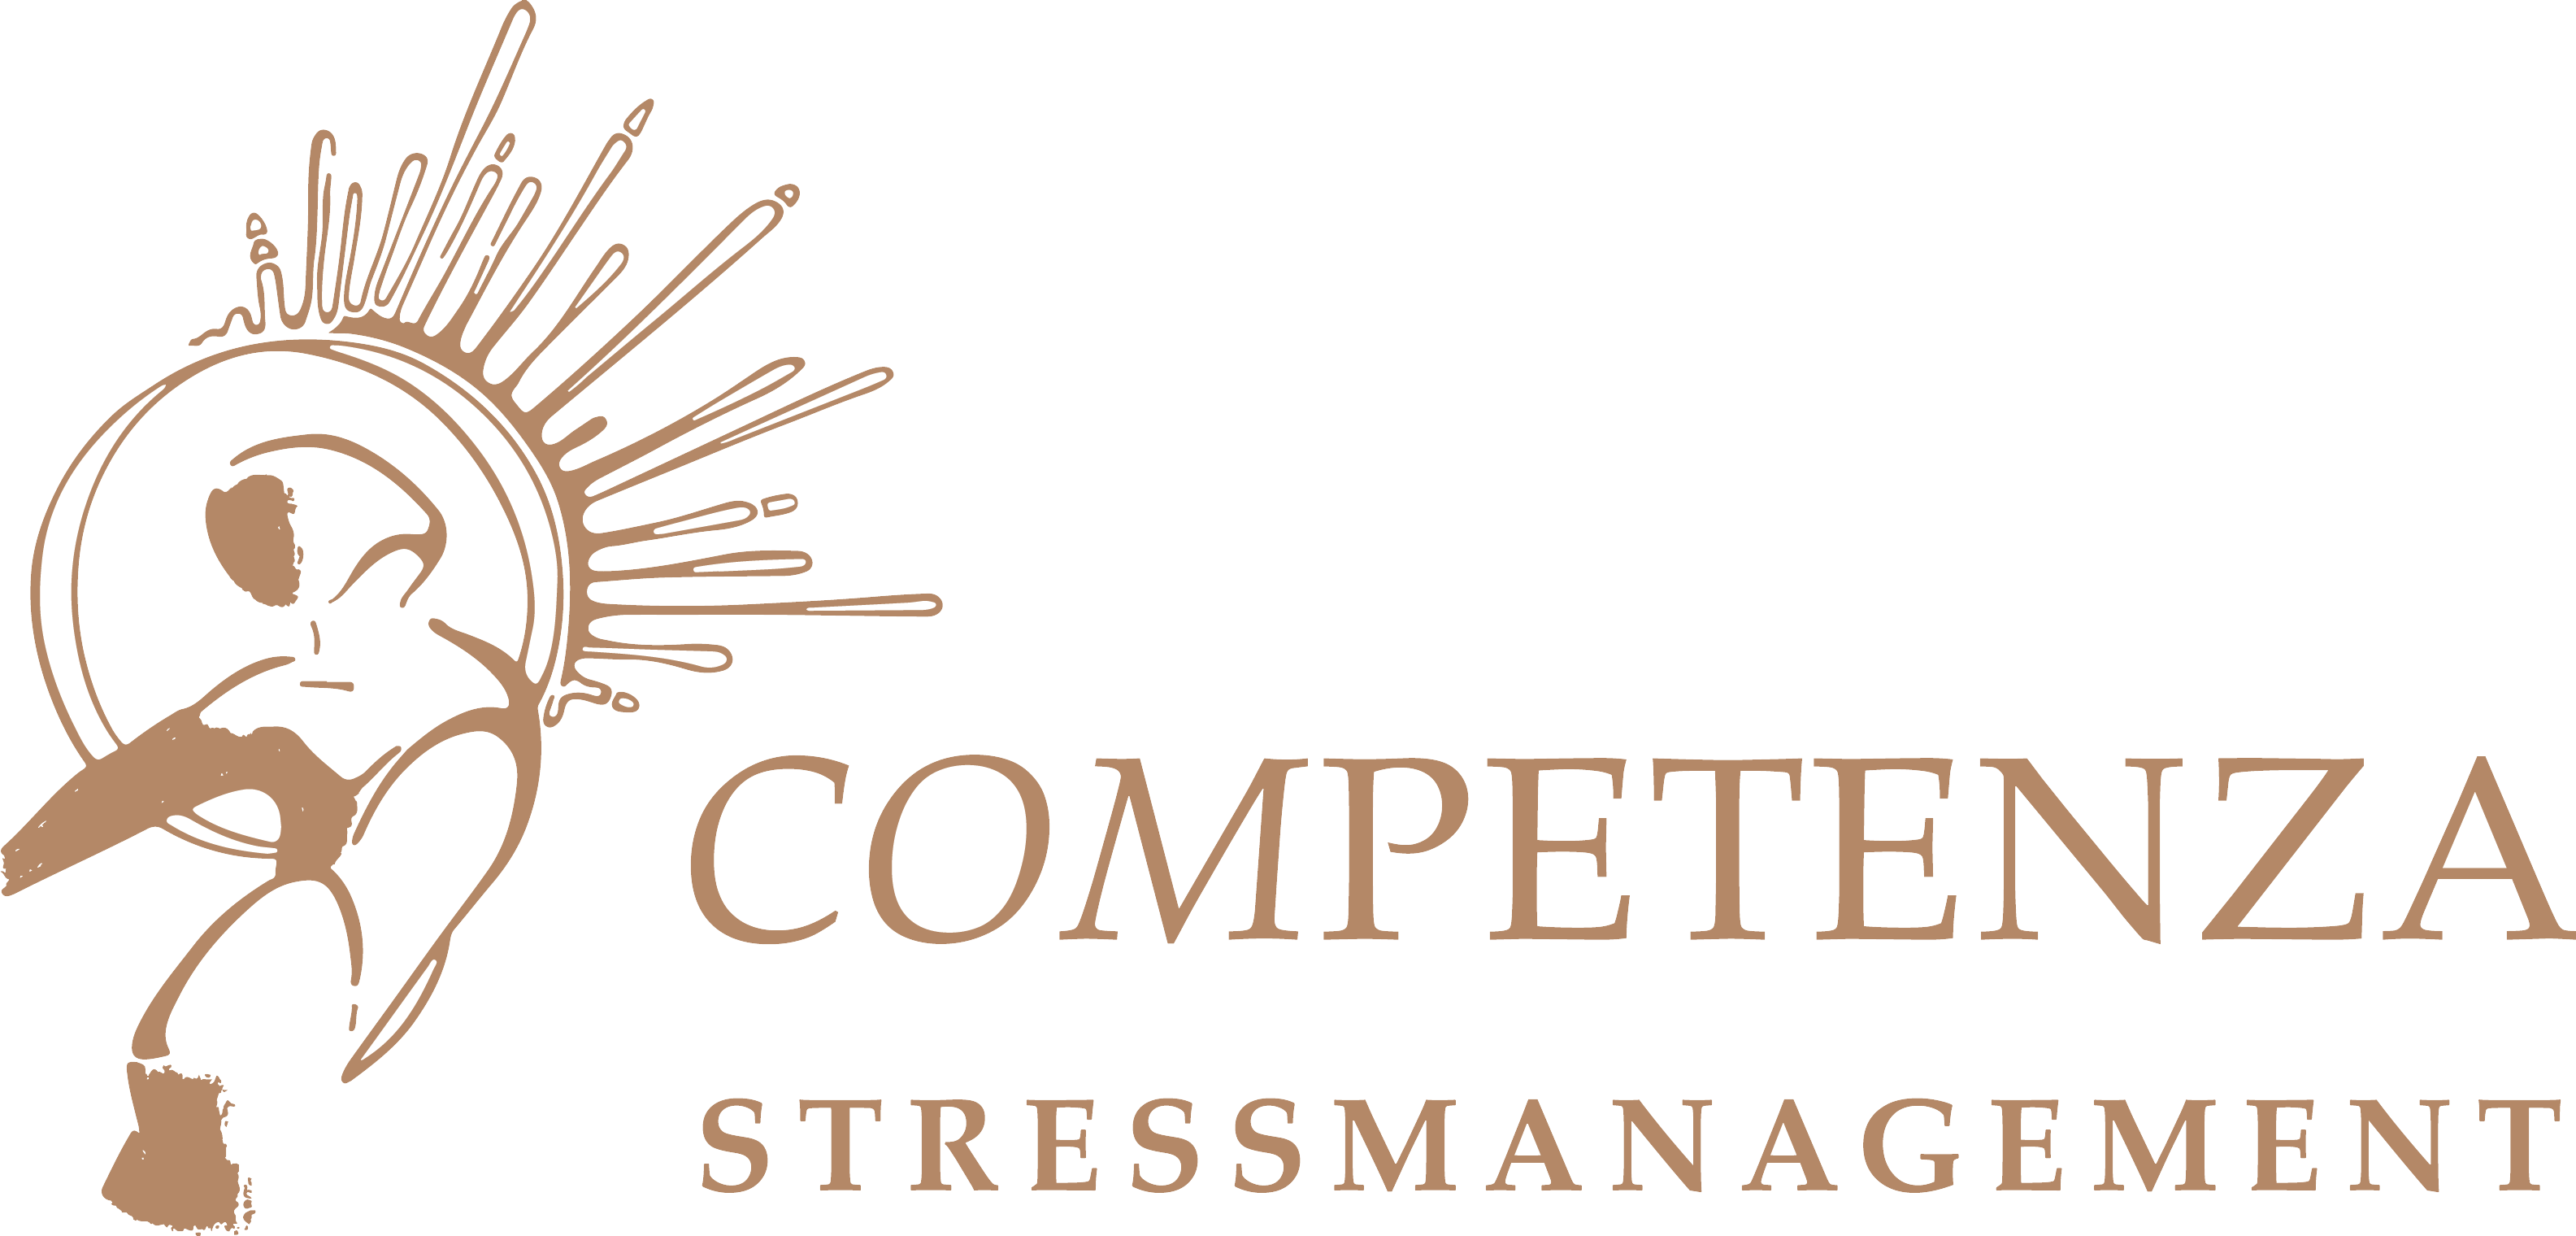 Competenza logo